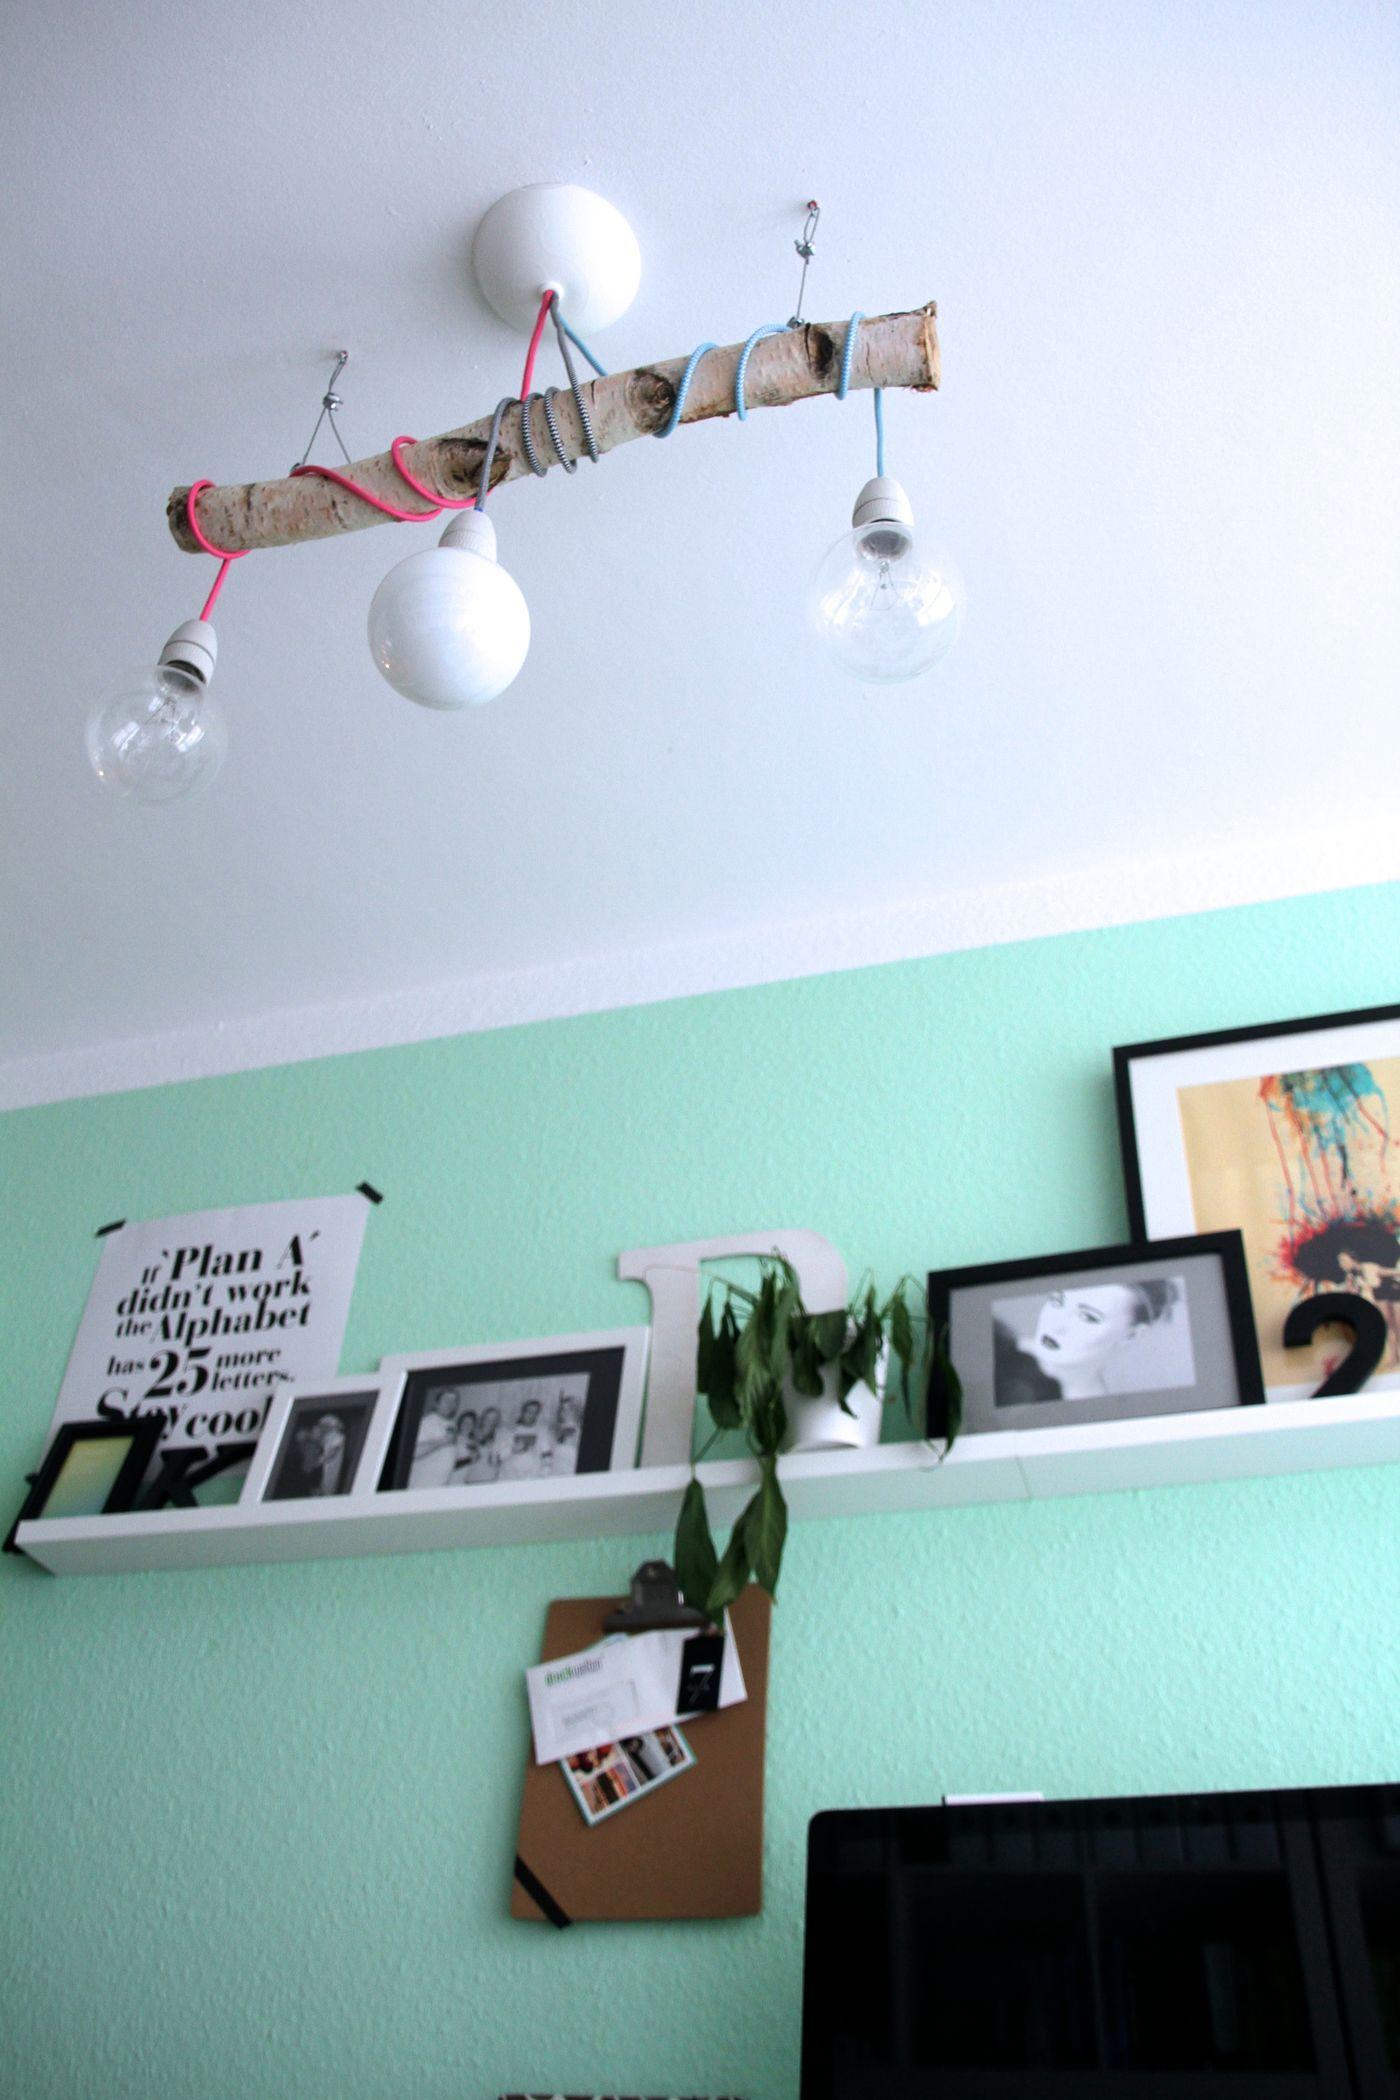 astlampe selber bauen diy hausbett selber bauen diy kojenbett nischenbett mimimia diy blog mit. Black Bedroom Furniture Sets. Home Design Ideas